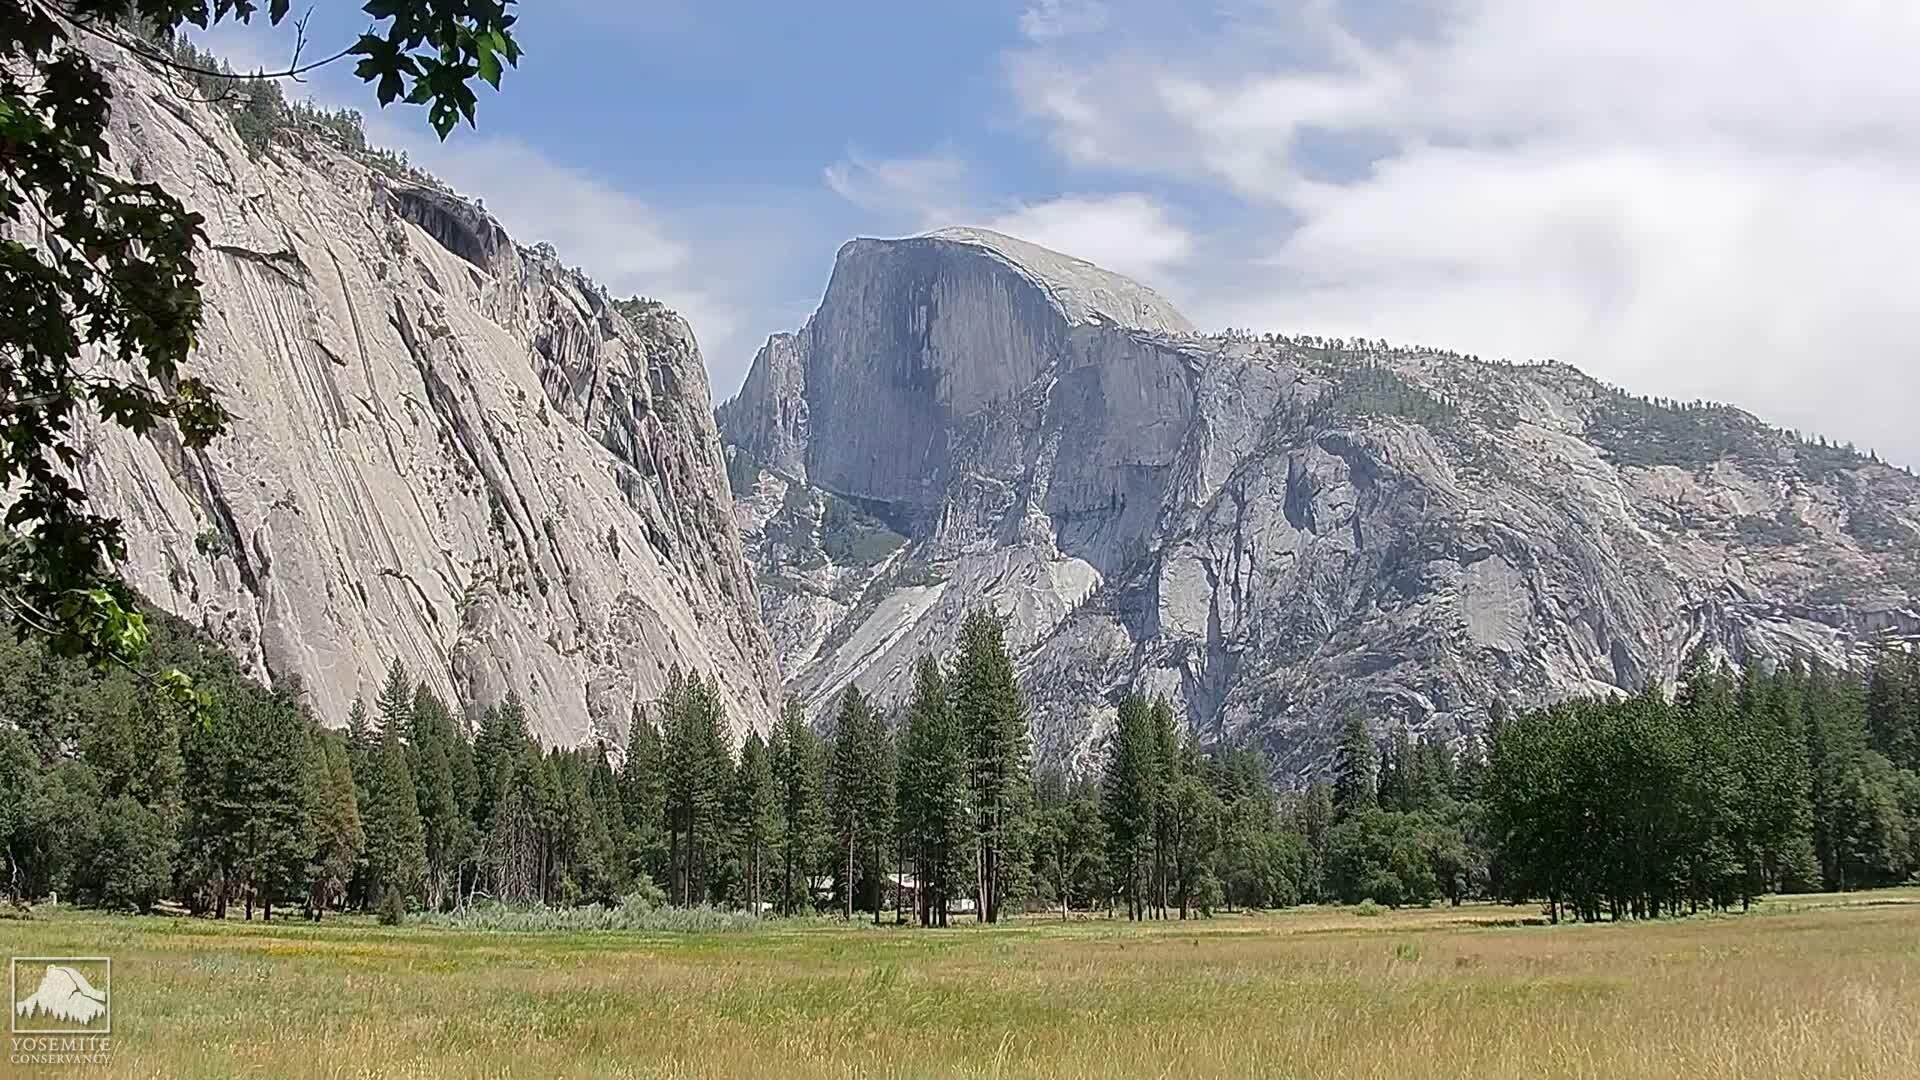 Yosemite-Nationalpark, Kalifornien Sa. 13:45